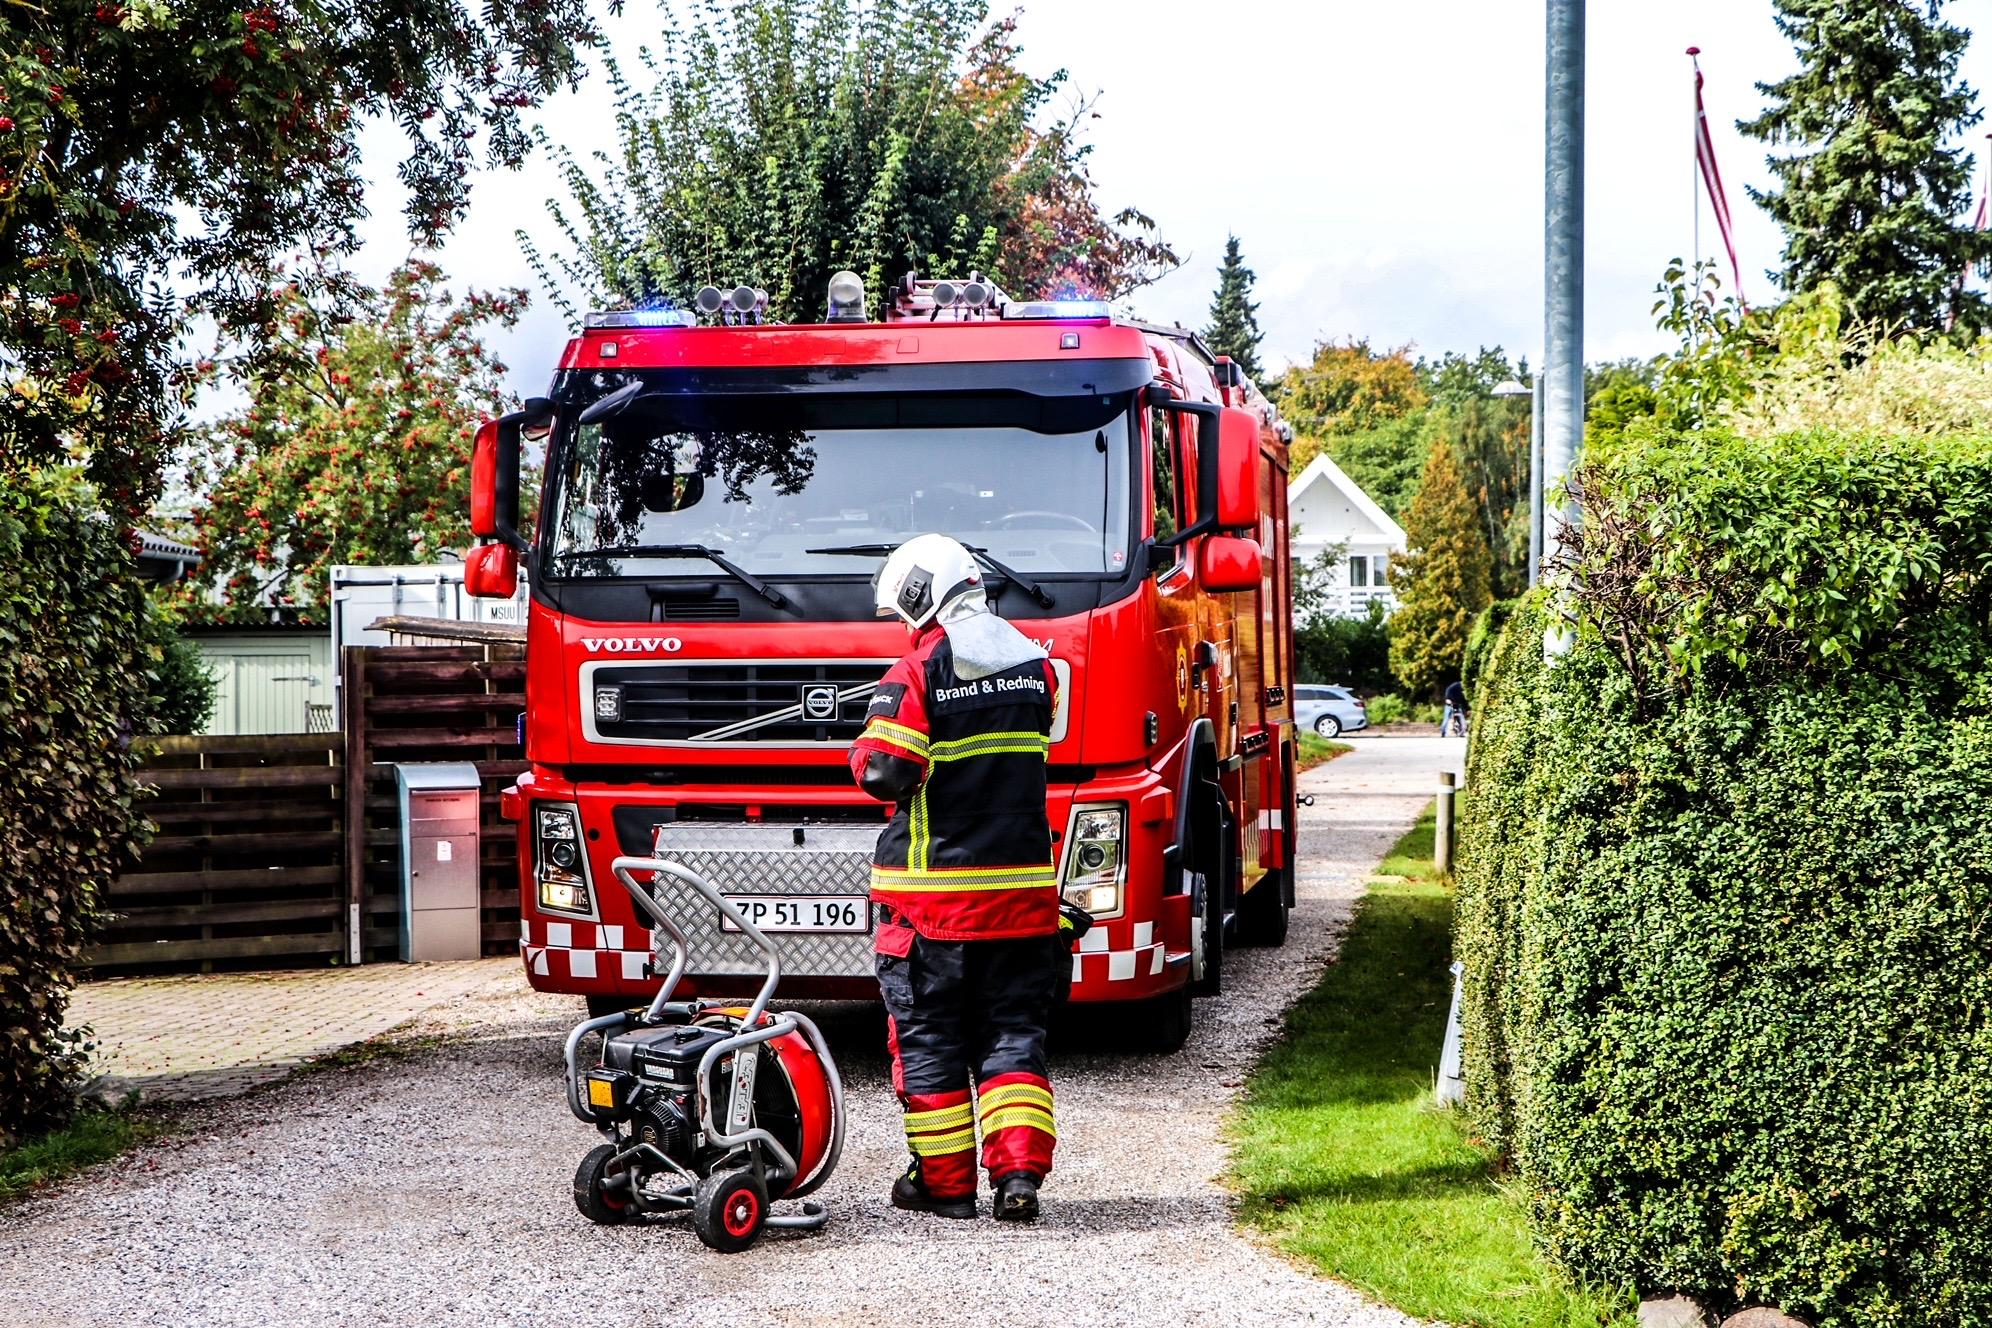 Brandvæsnet fremme i Solrød - ild i villa